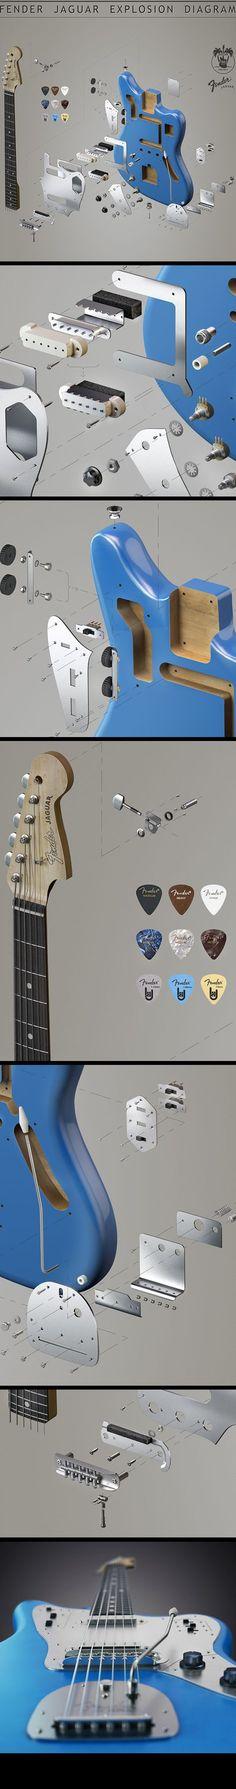 Fender Jaguar by Vladimir Andreev, via Behance